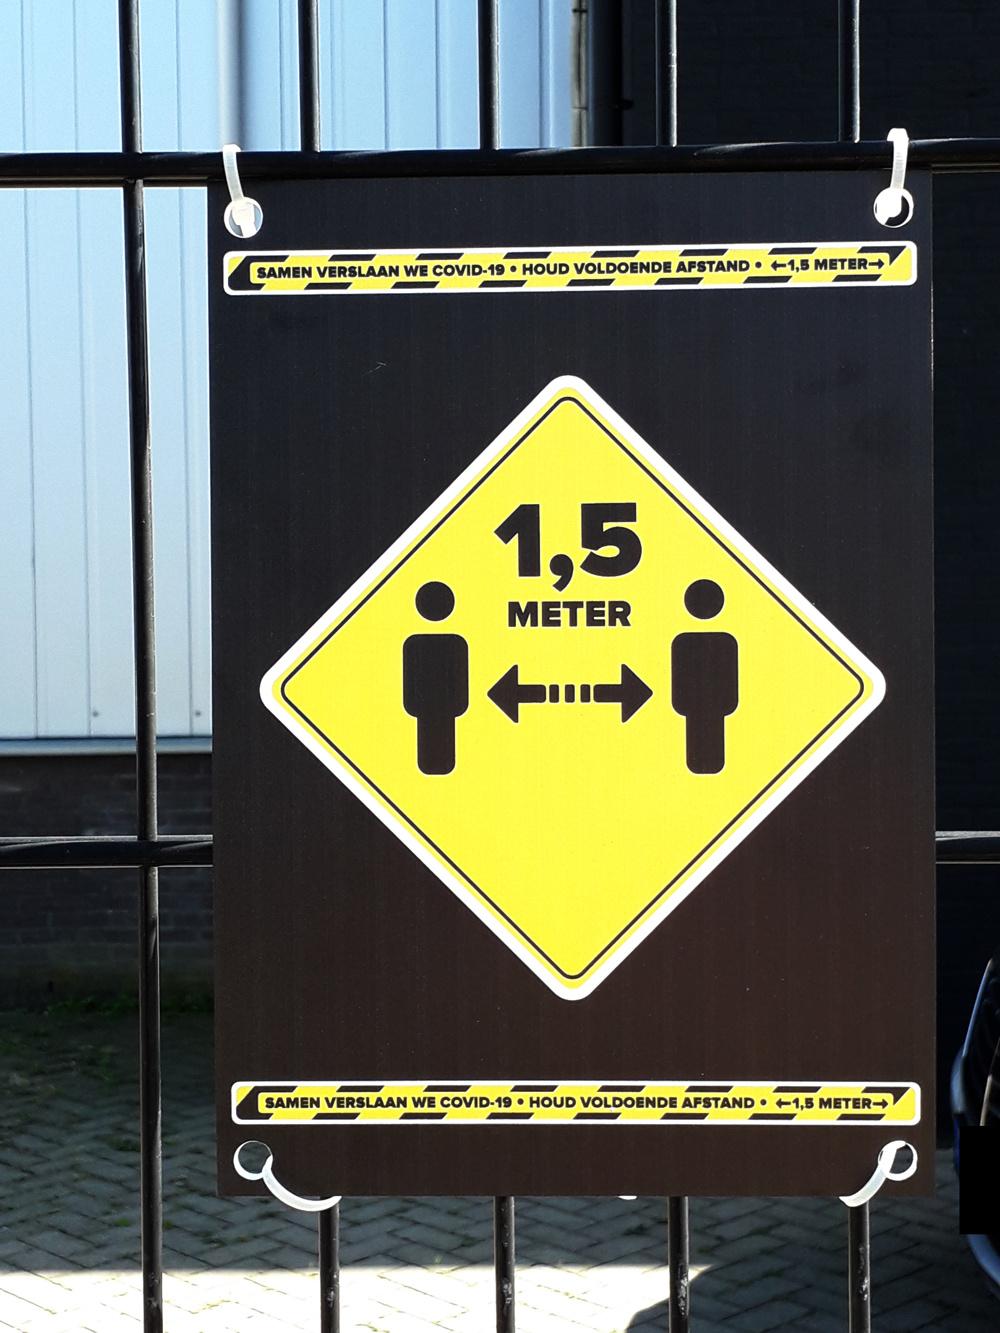 Mantenga la señal a 1.5 metros de distancia